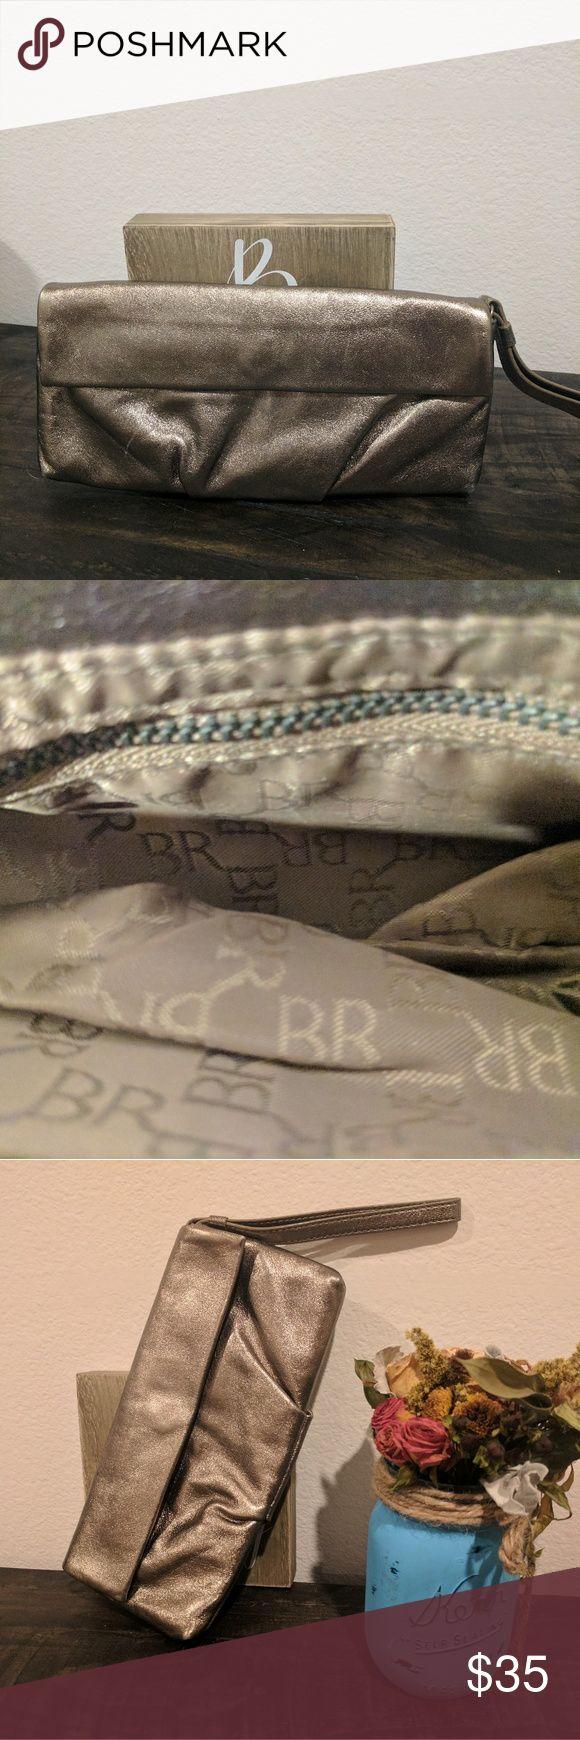 Banana Republic gold clutch purse Newer condition from Banana Republic gold clutch. Banana Republic Bags Clutches & Wristlets